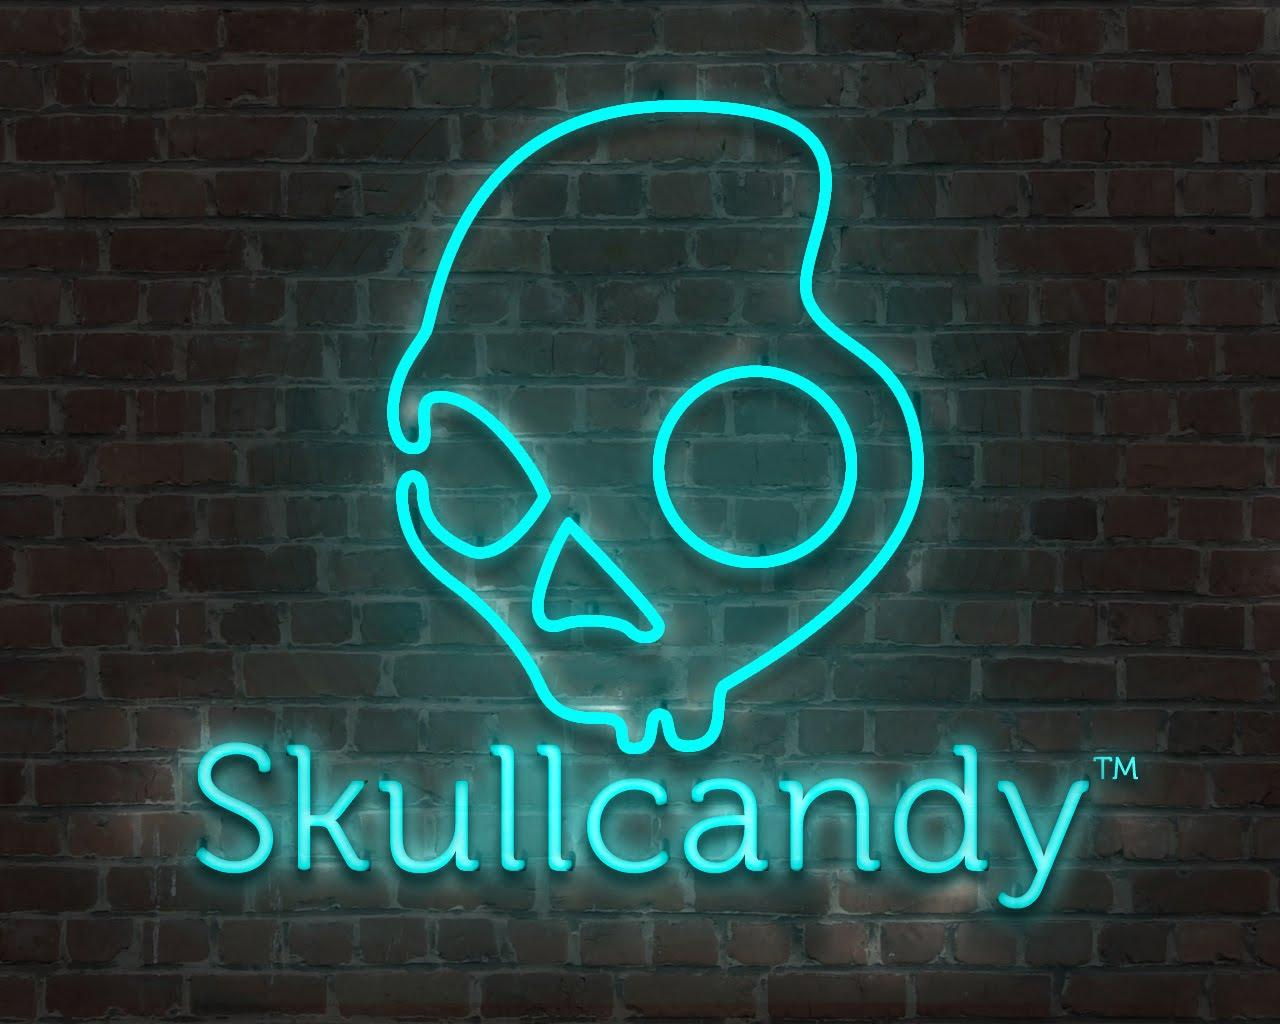 skull candy wallpaper wallpapersafari